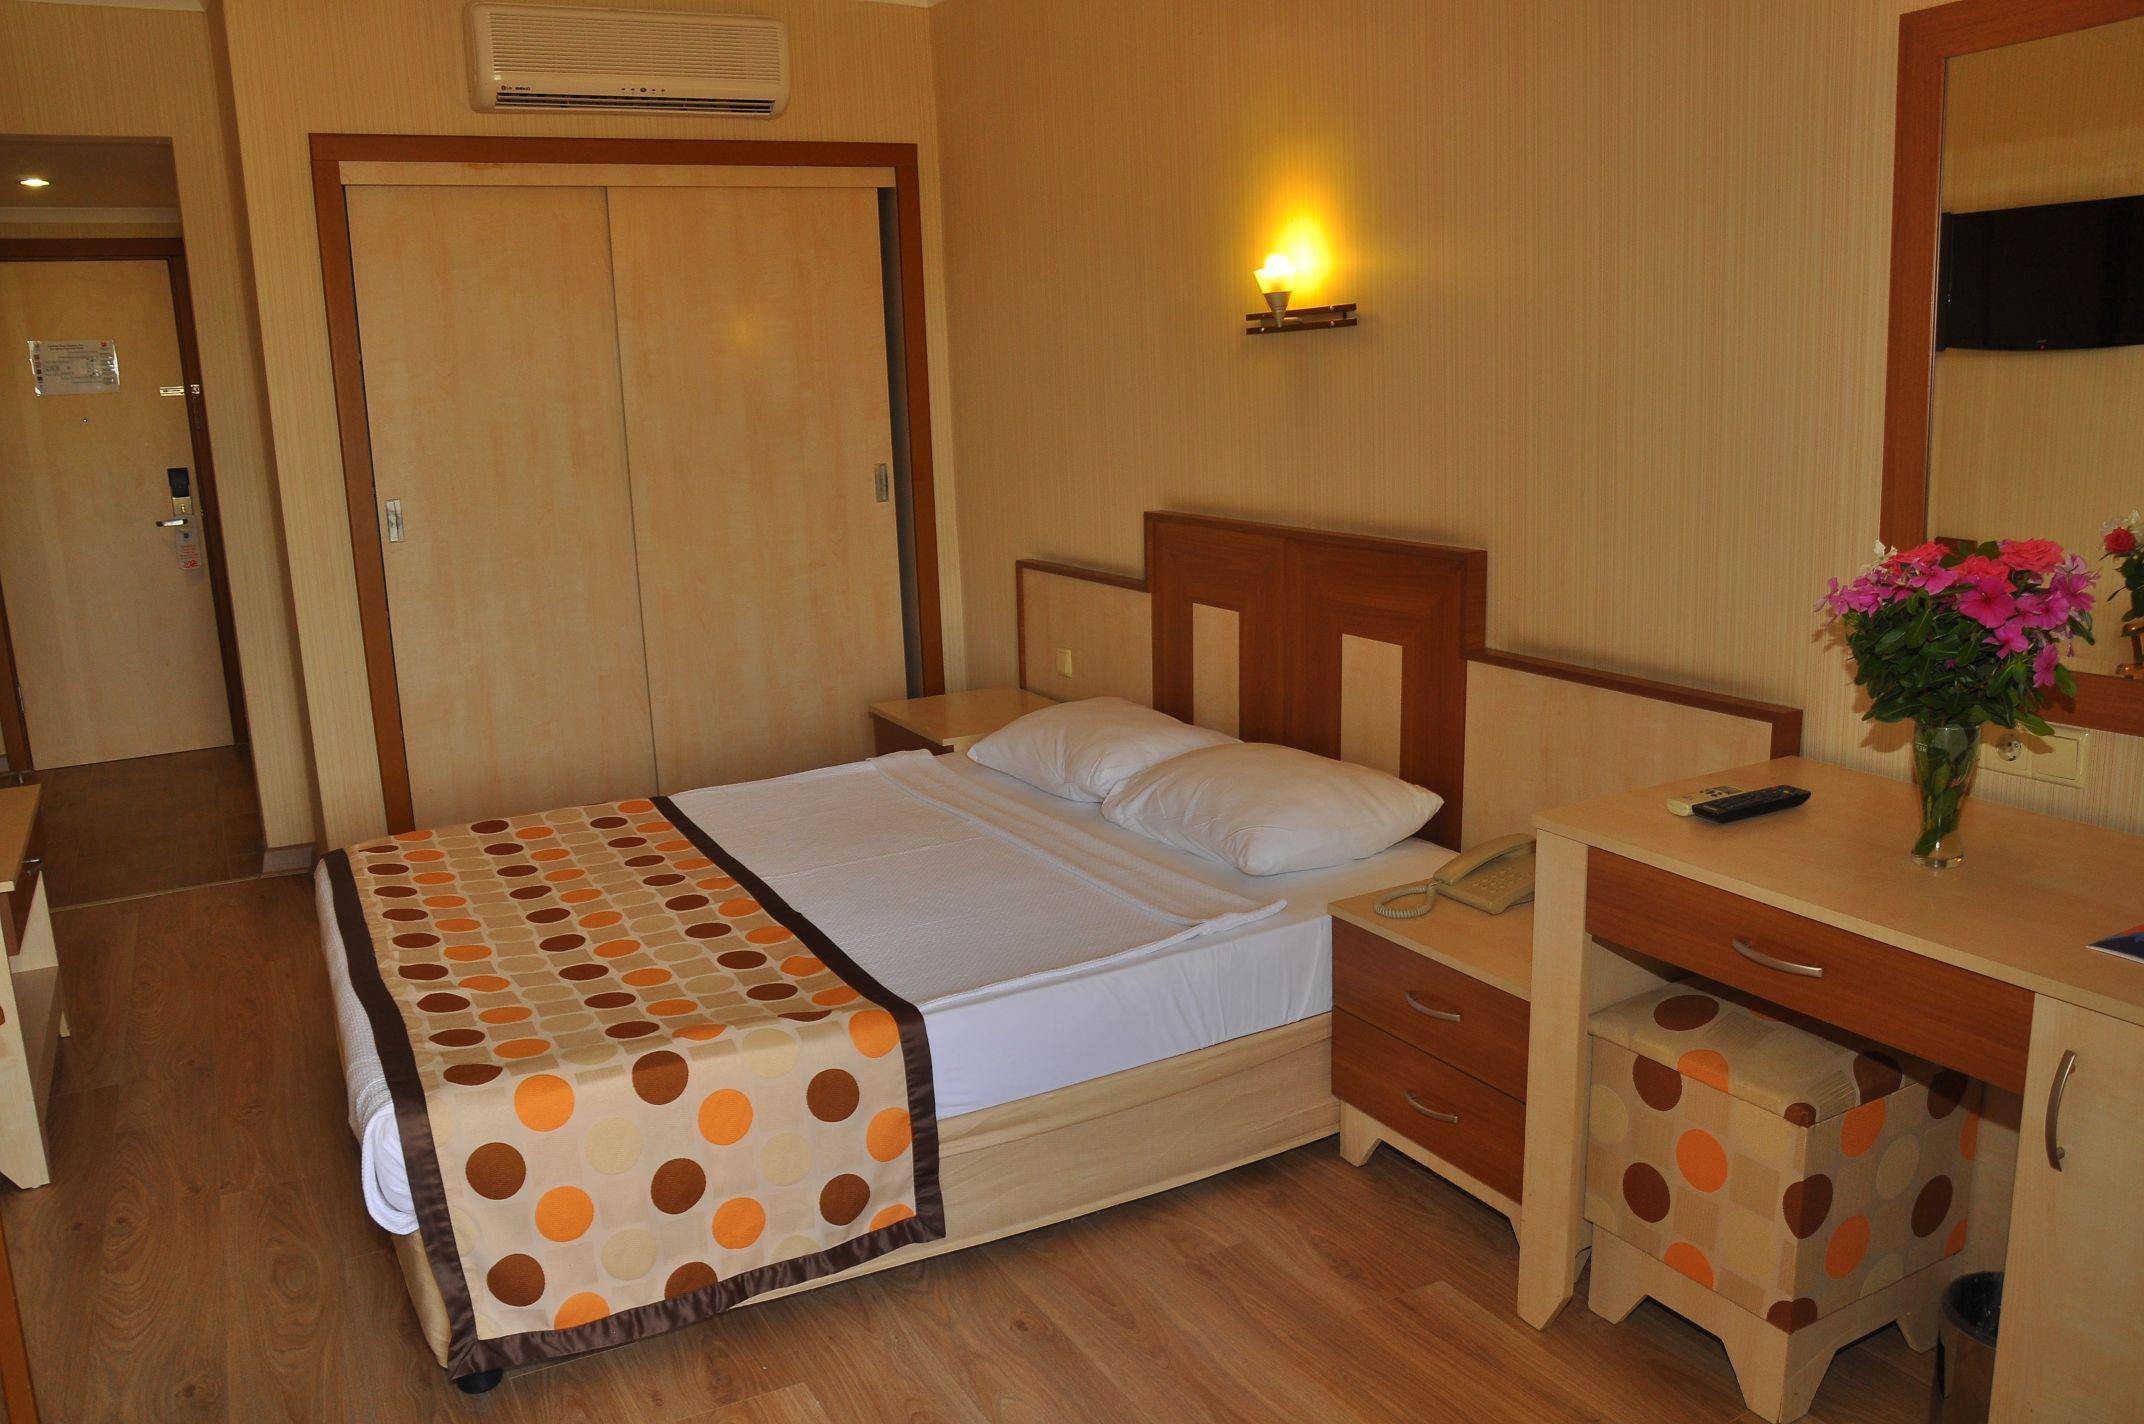 http://www.orextravel.sk/OREX/hotelphotos/stella-beach-hotel-alanya-general-002.jpg